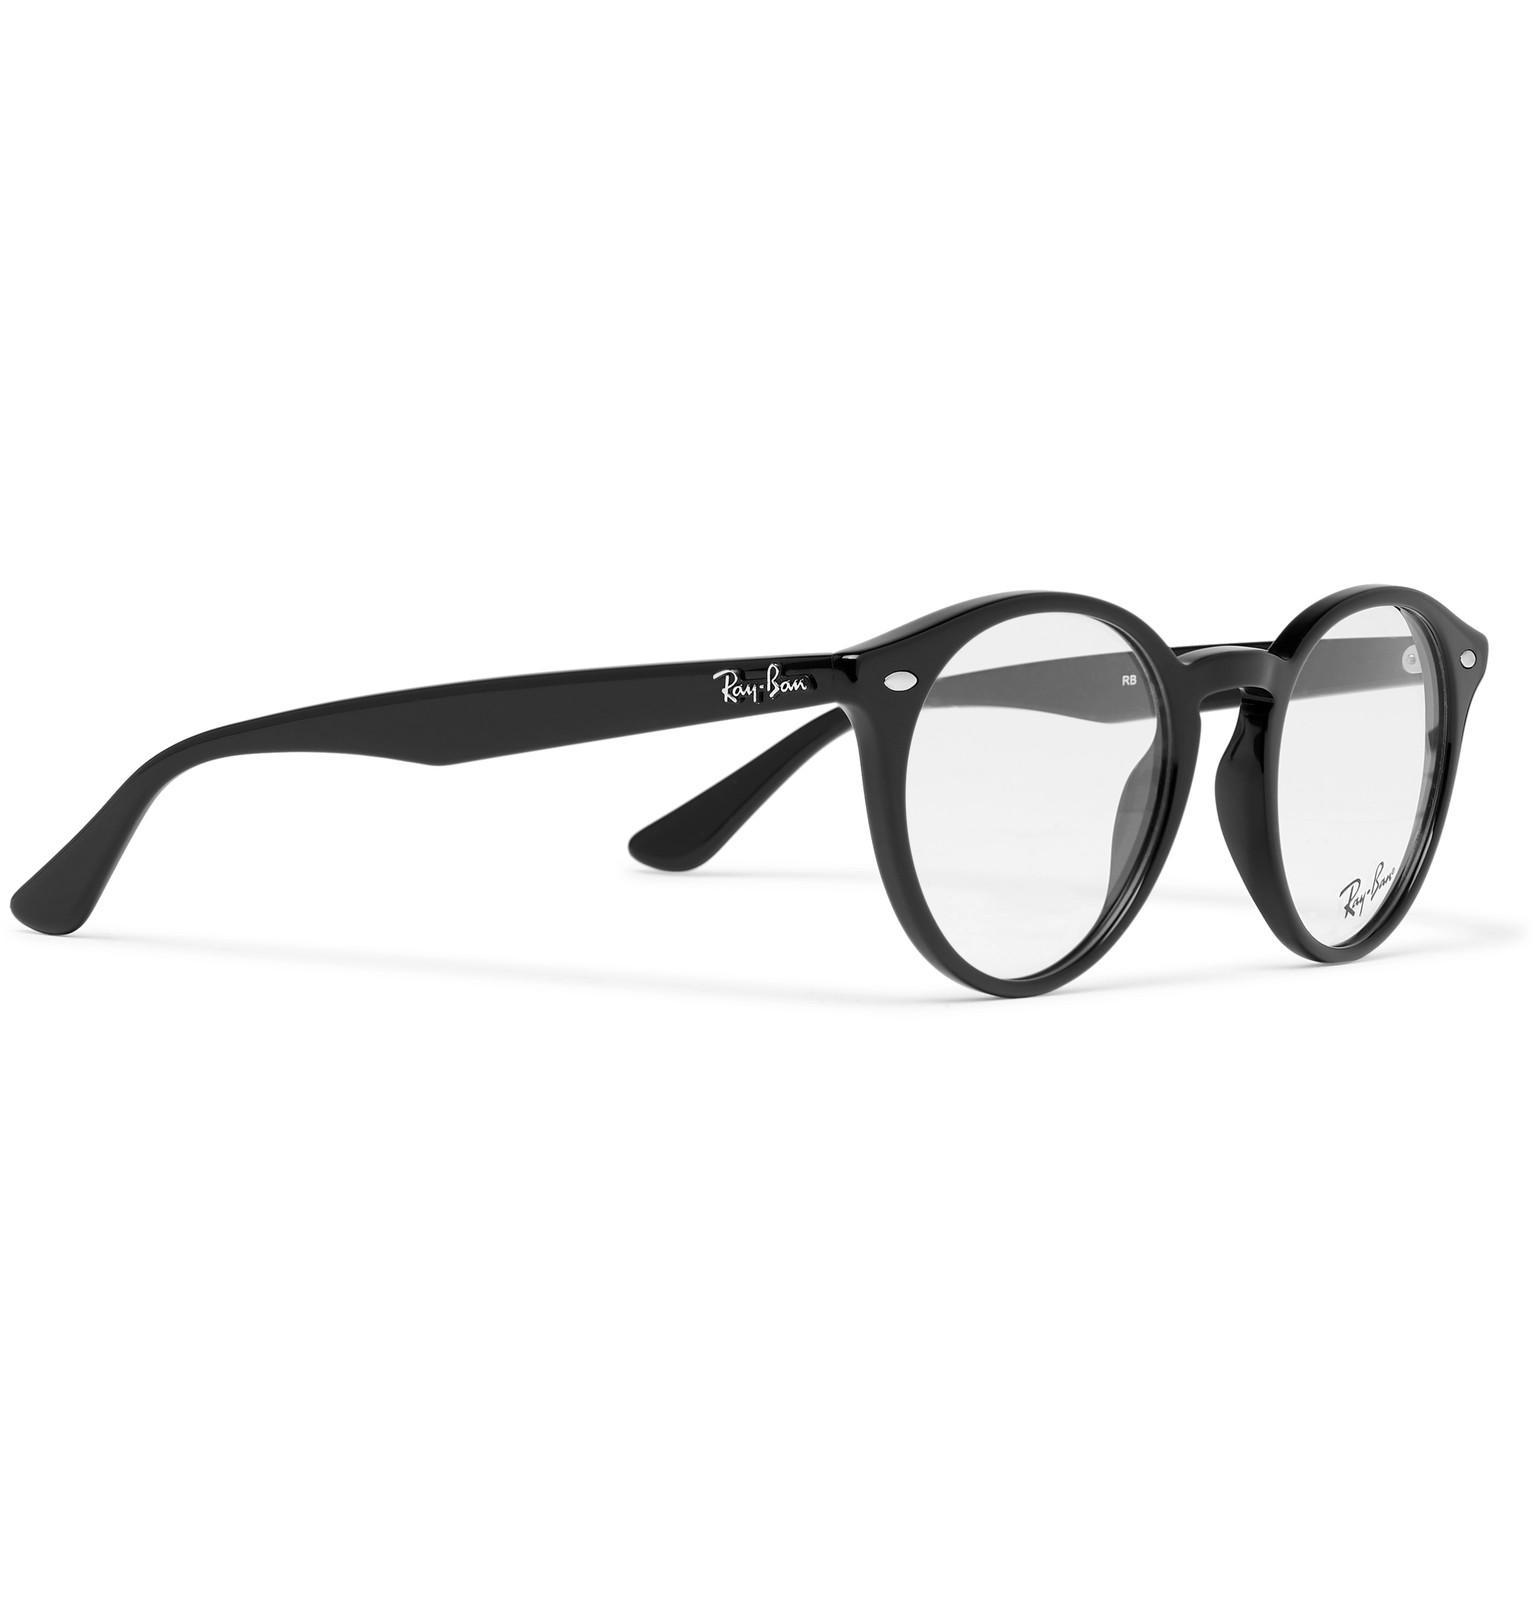 54344ada1d Ray-Ban - Black Round-frame Acetate Optical Glasses for Men - Lyst. View  fullscreen